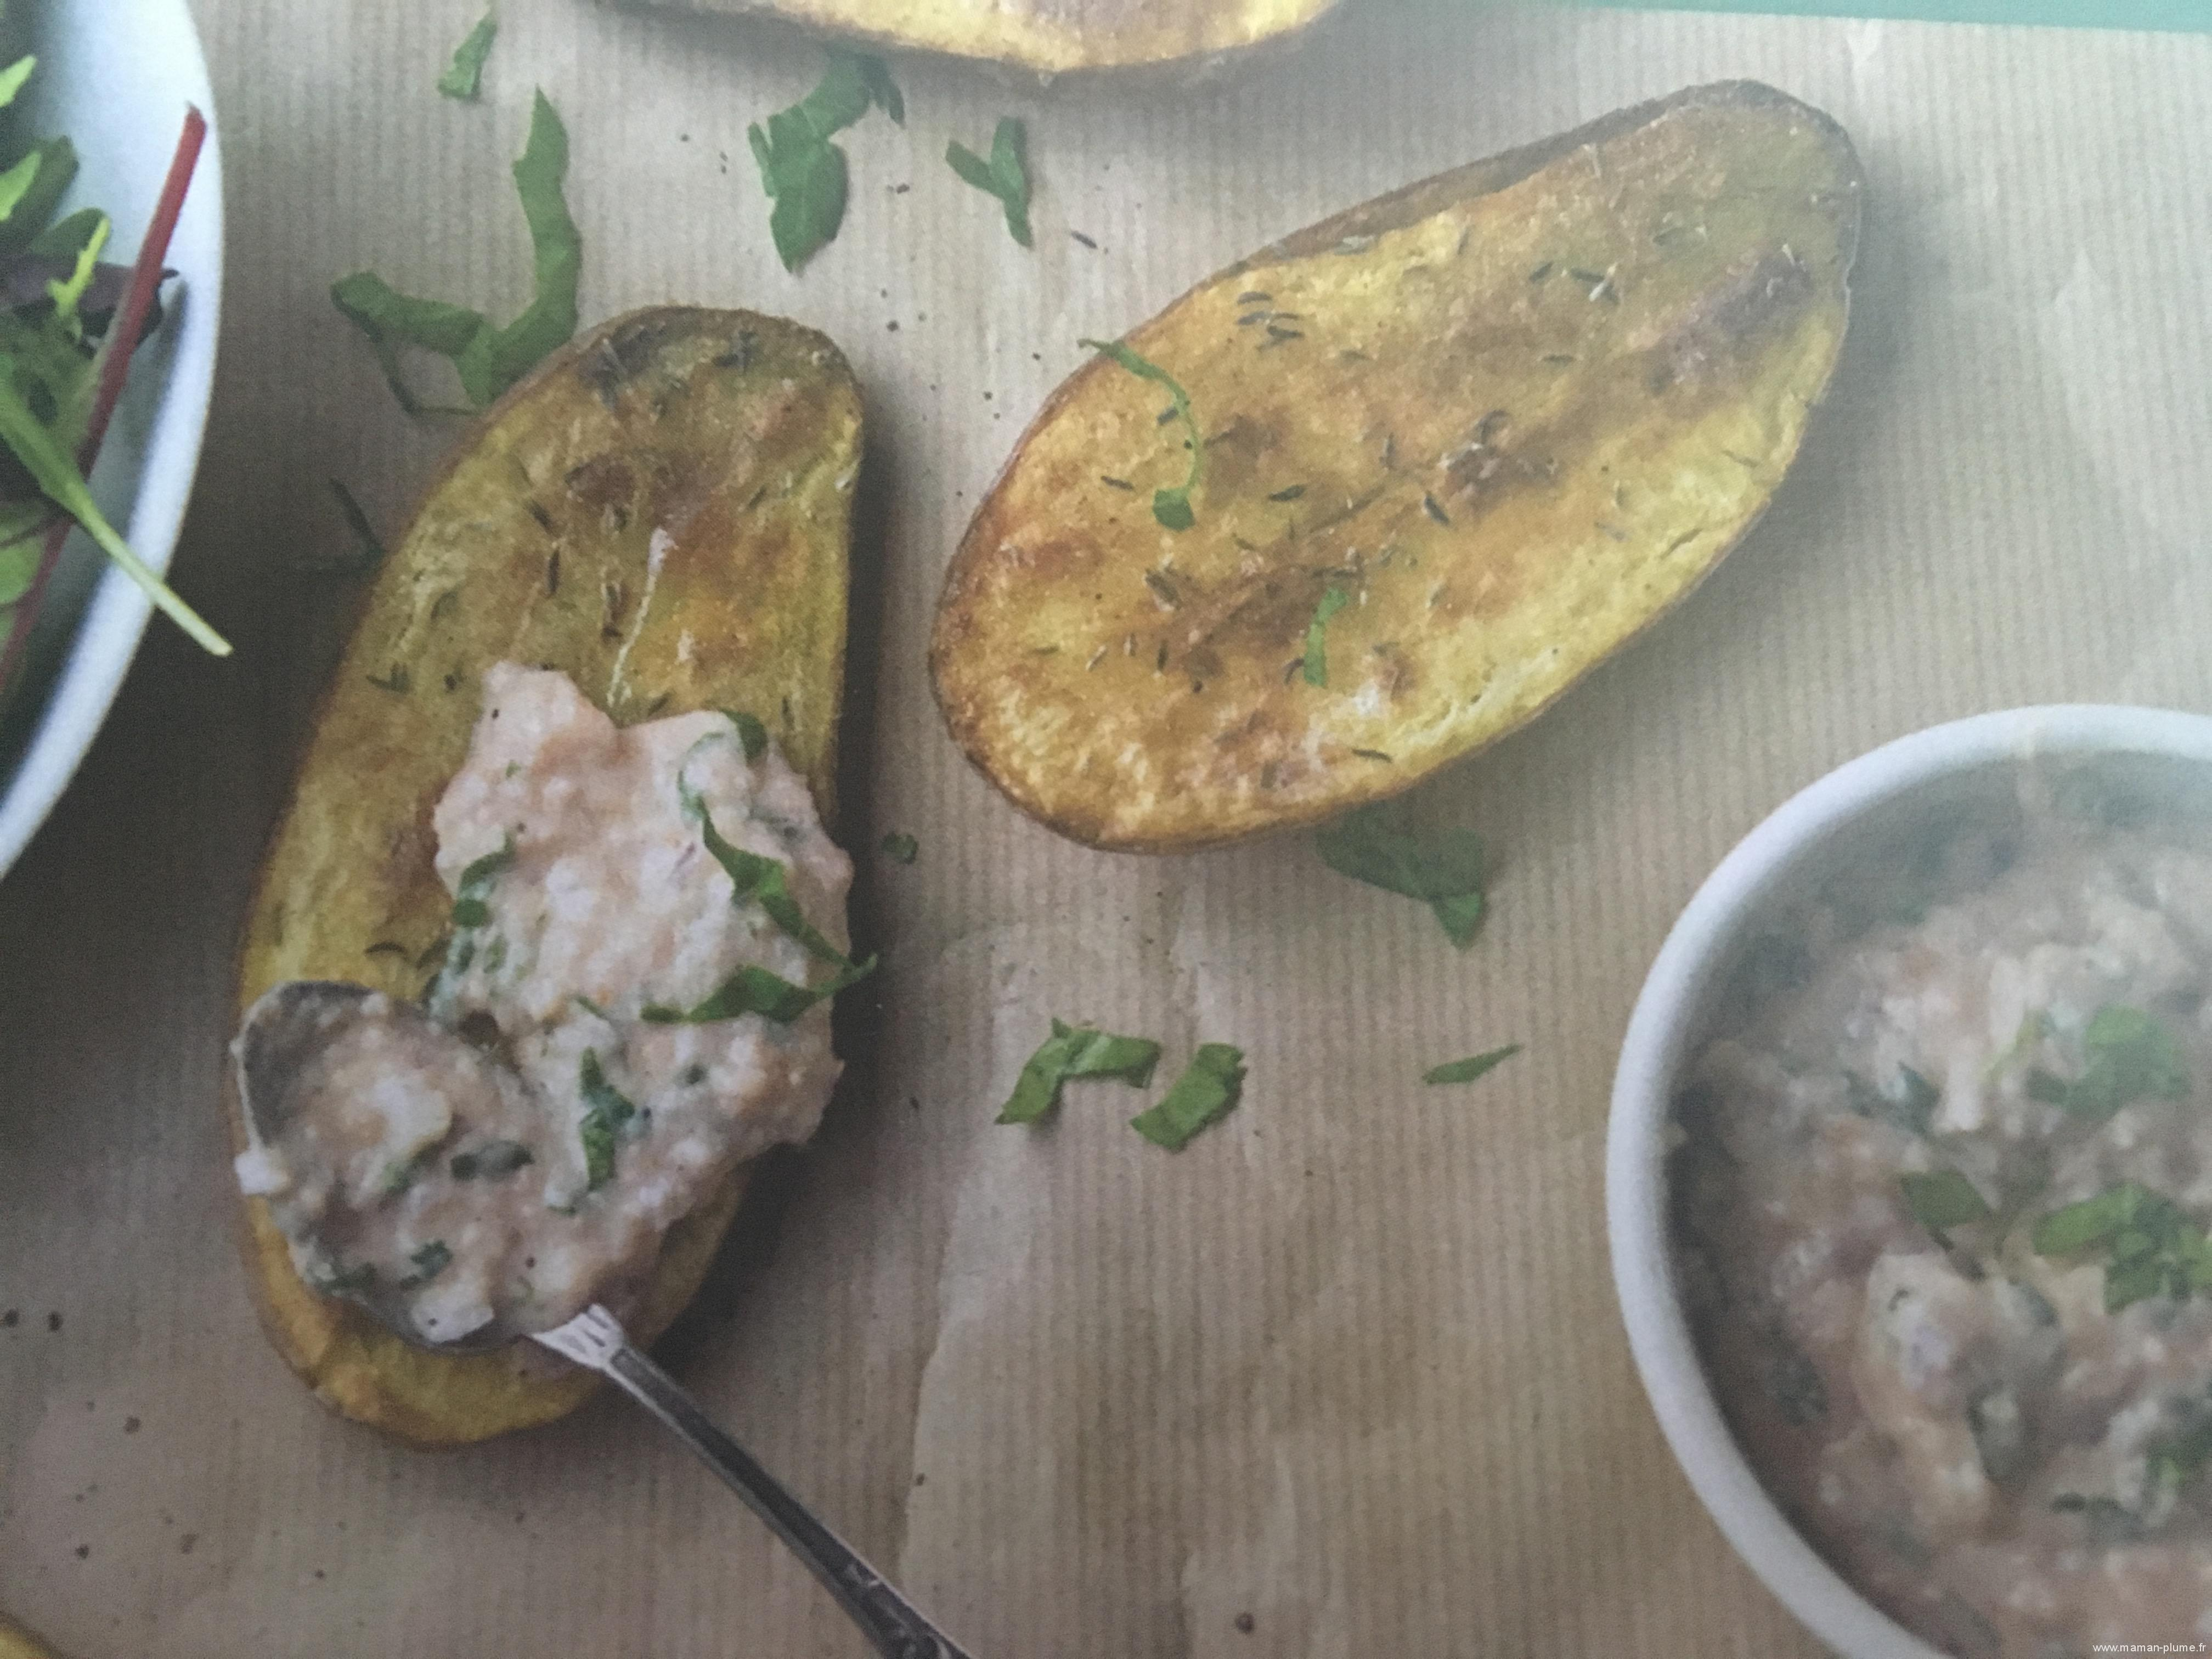 Les paniers recettes Quitoque, la cuisine facile !